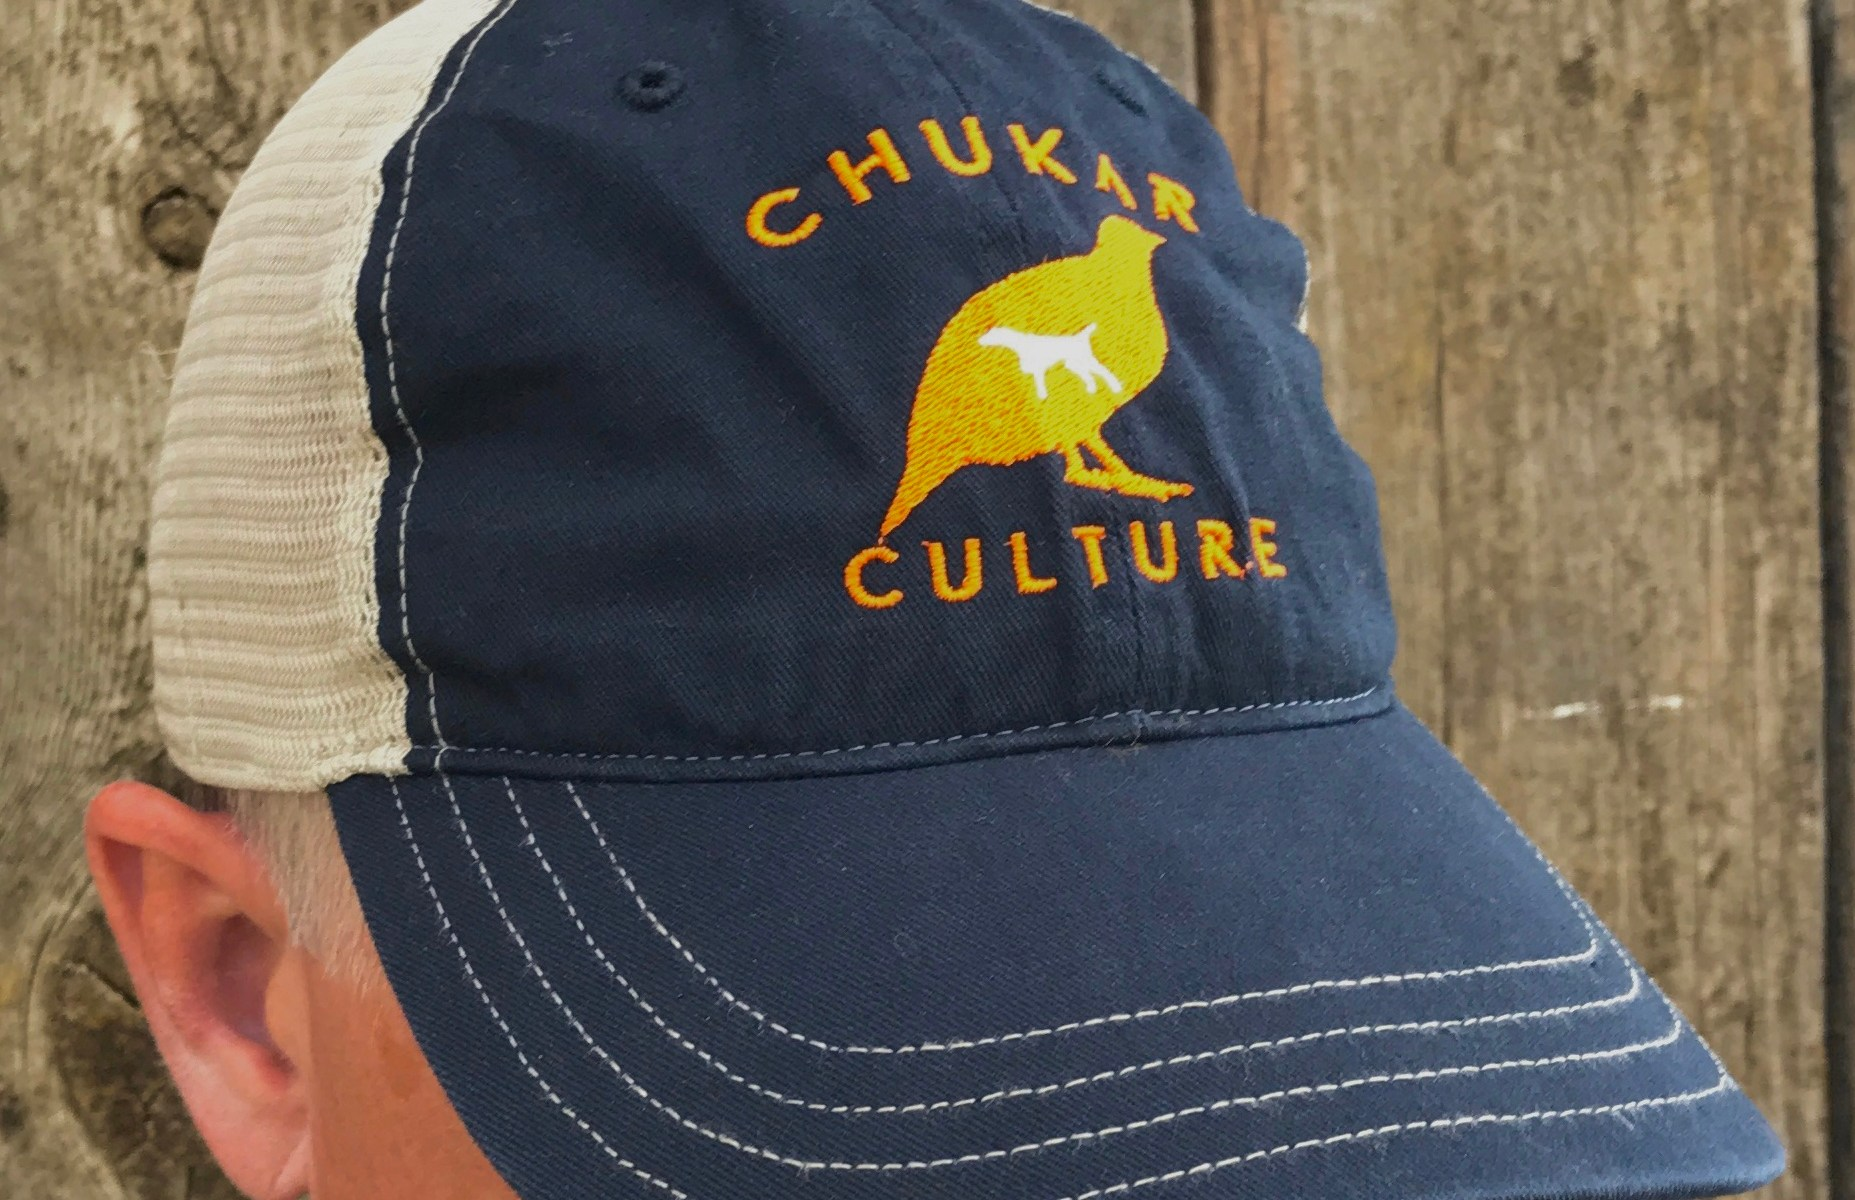 Richardson 111 Chukar Culture hat